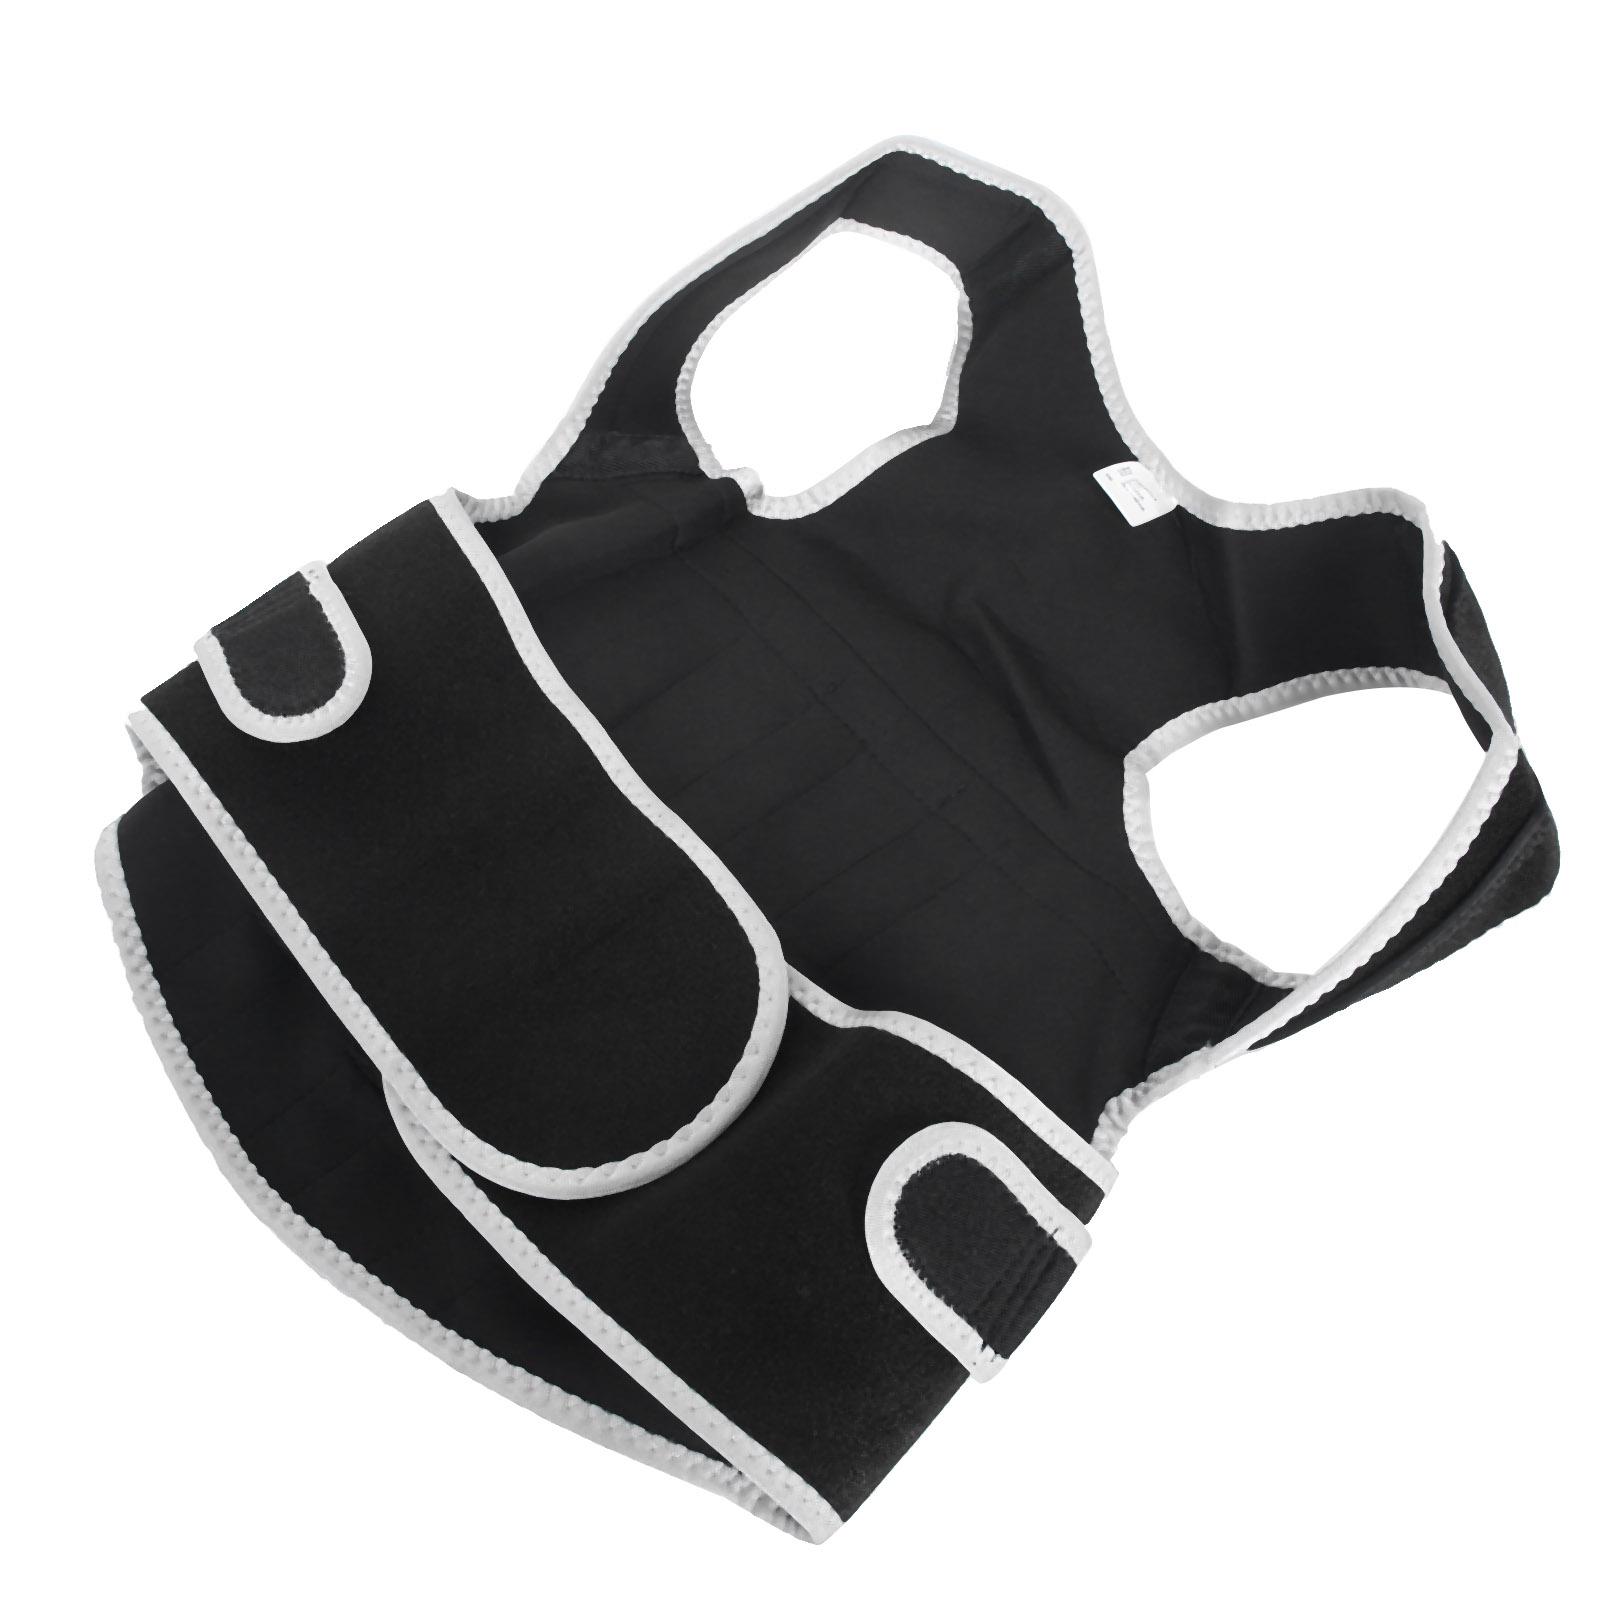 Posture-Corrector-Breathable-Back-Waist-Spine-Support-Belt-Brace-Straightener-GL thumbnail 17